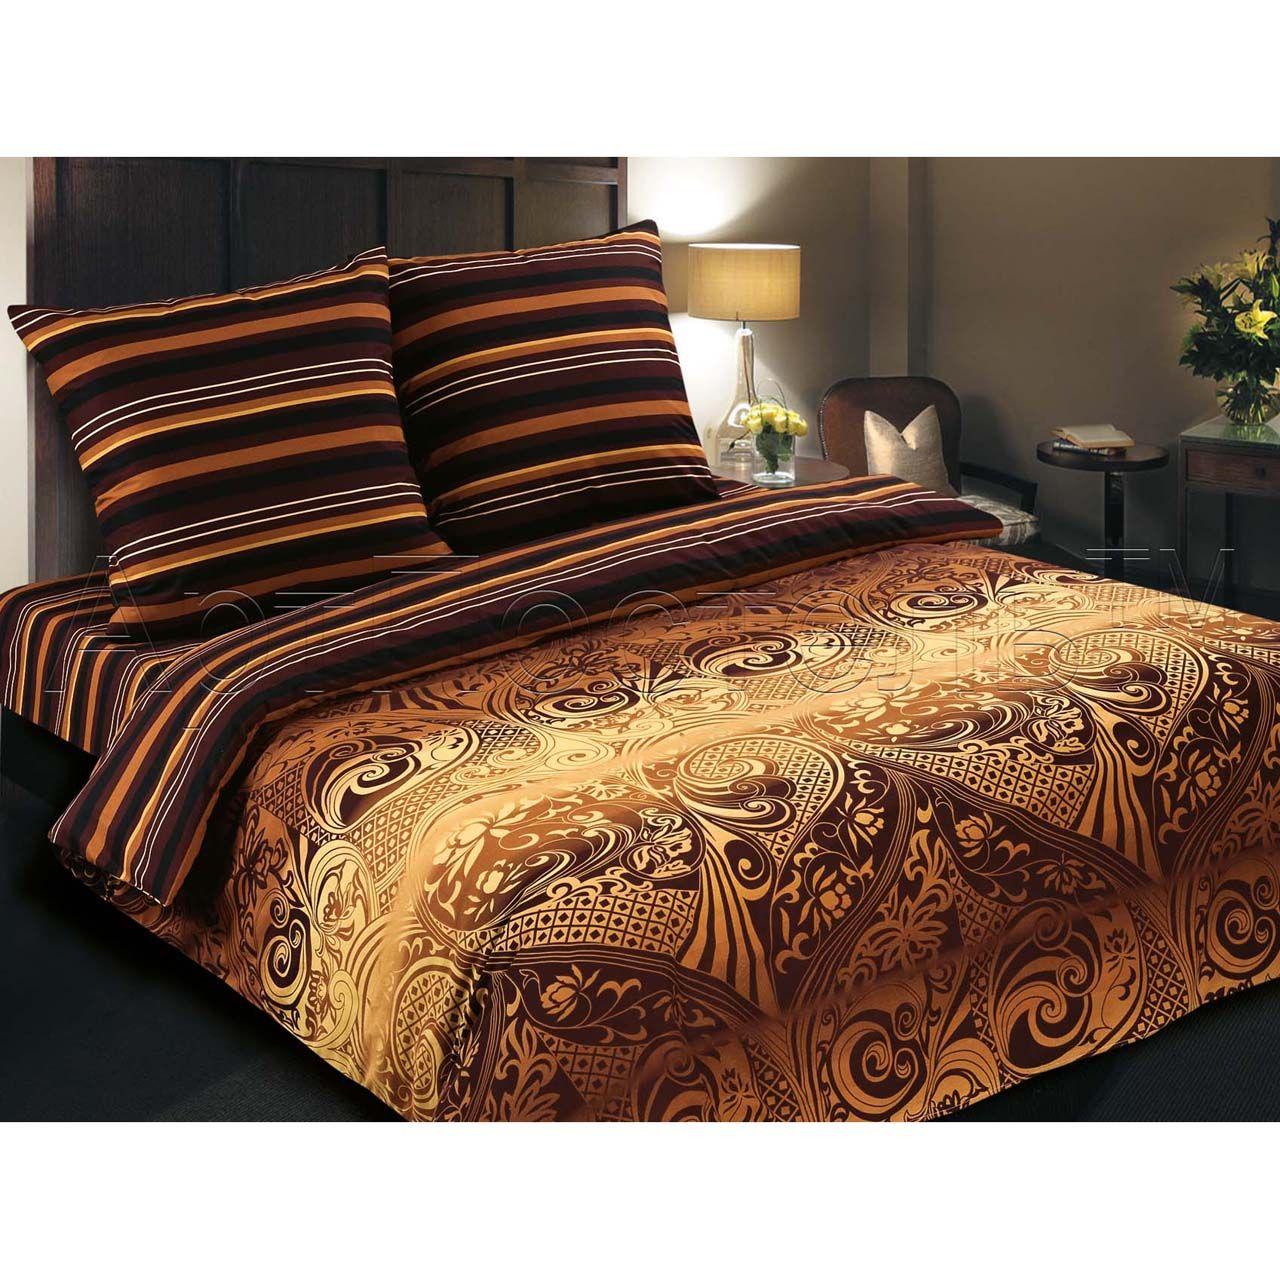 Bed linen set 1.5 sleeping Arabica